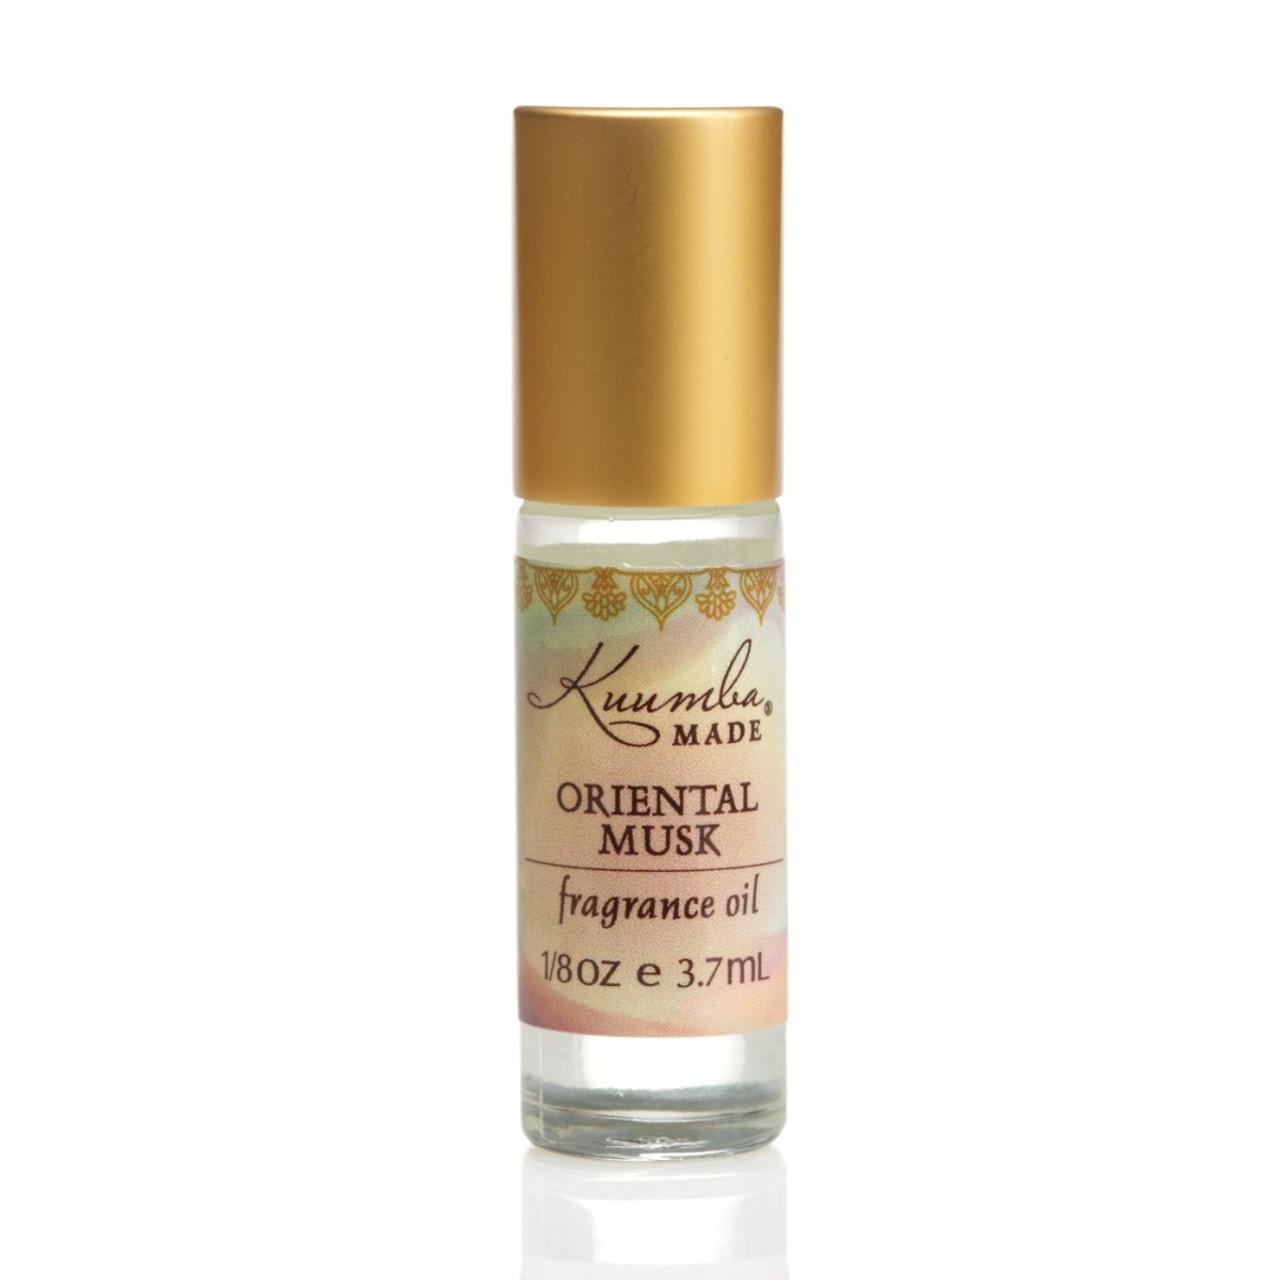 Kuumba Made Oriental Musk Fragrance Oil